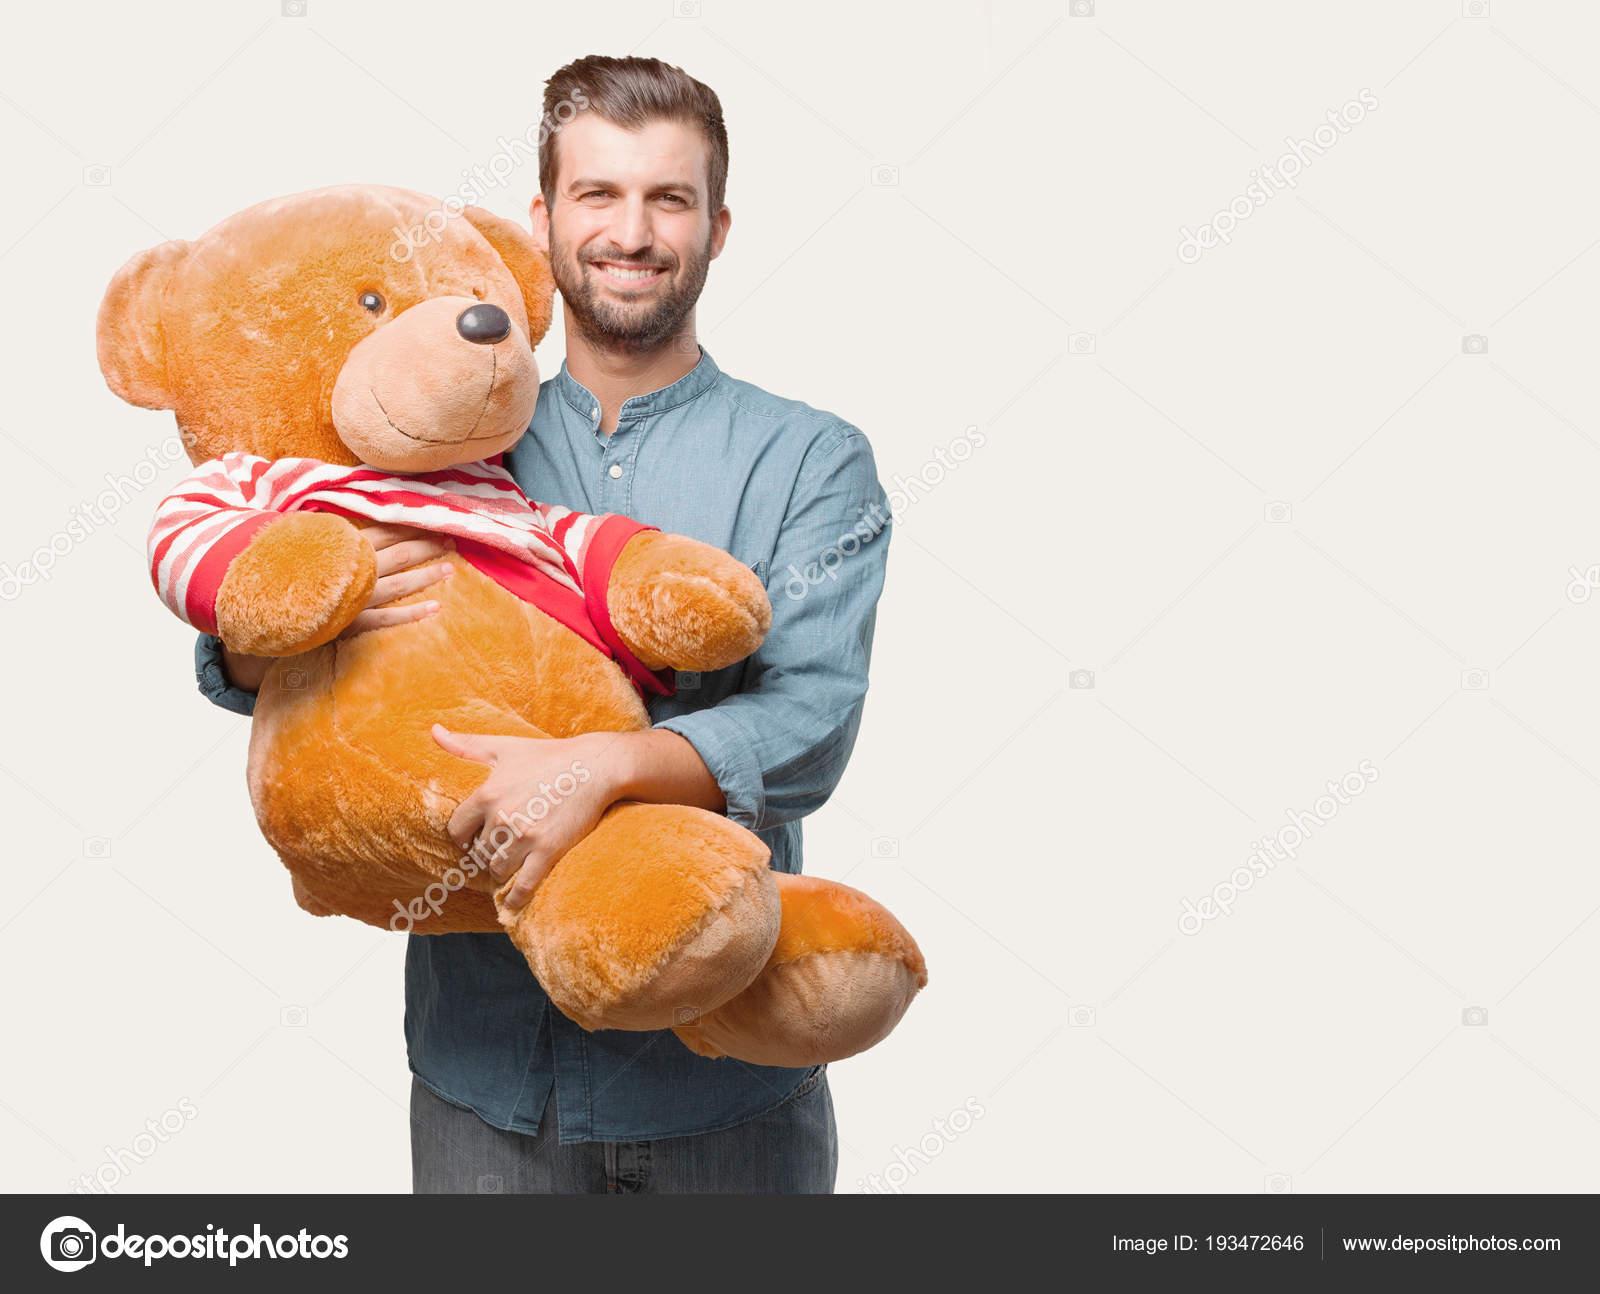 Bear kissing man